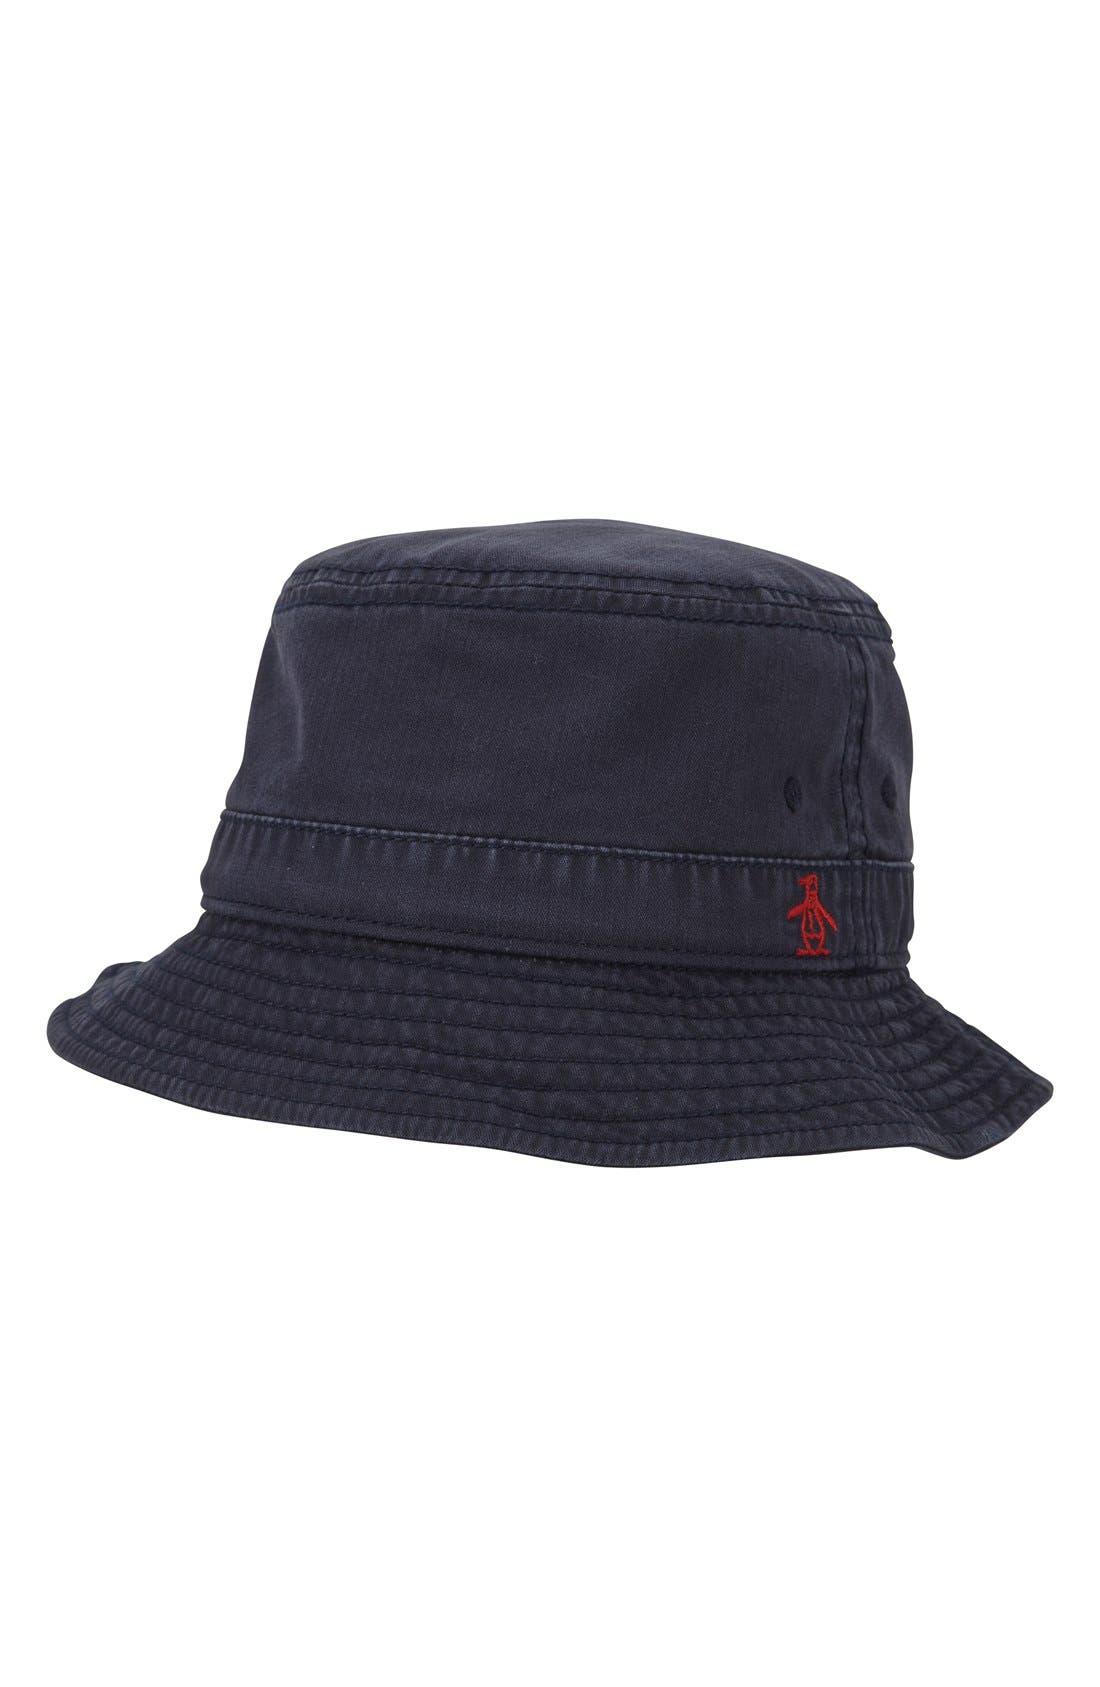 Alternate Image 1 Selected - Original Penguin 'Ferrer' Bucket Hat